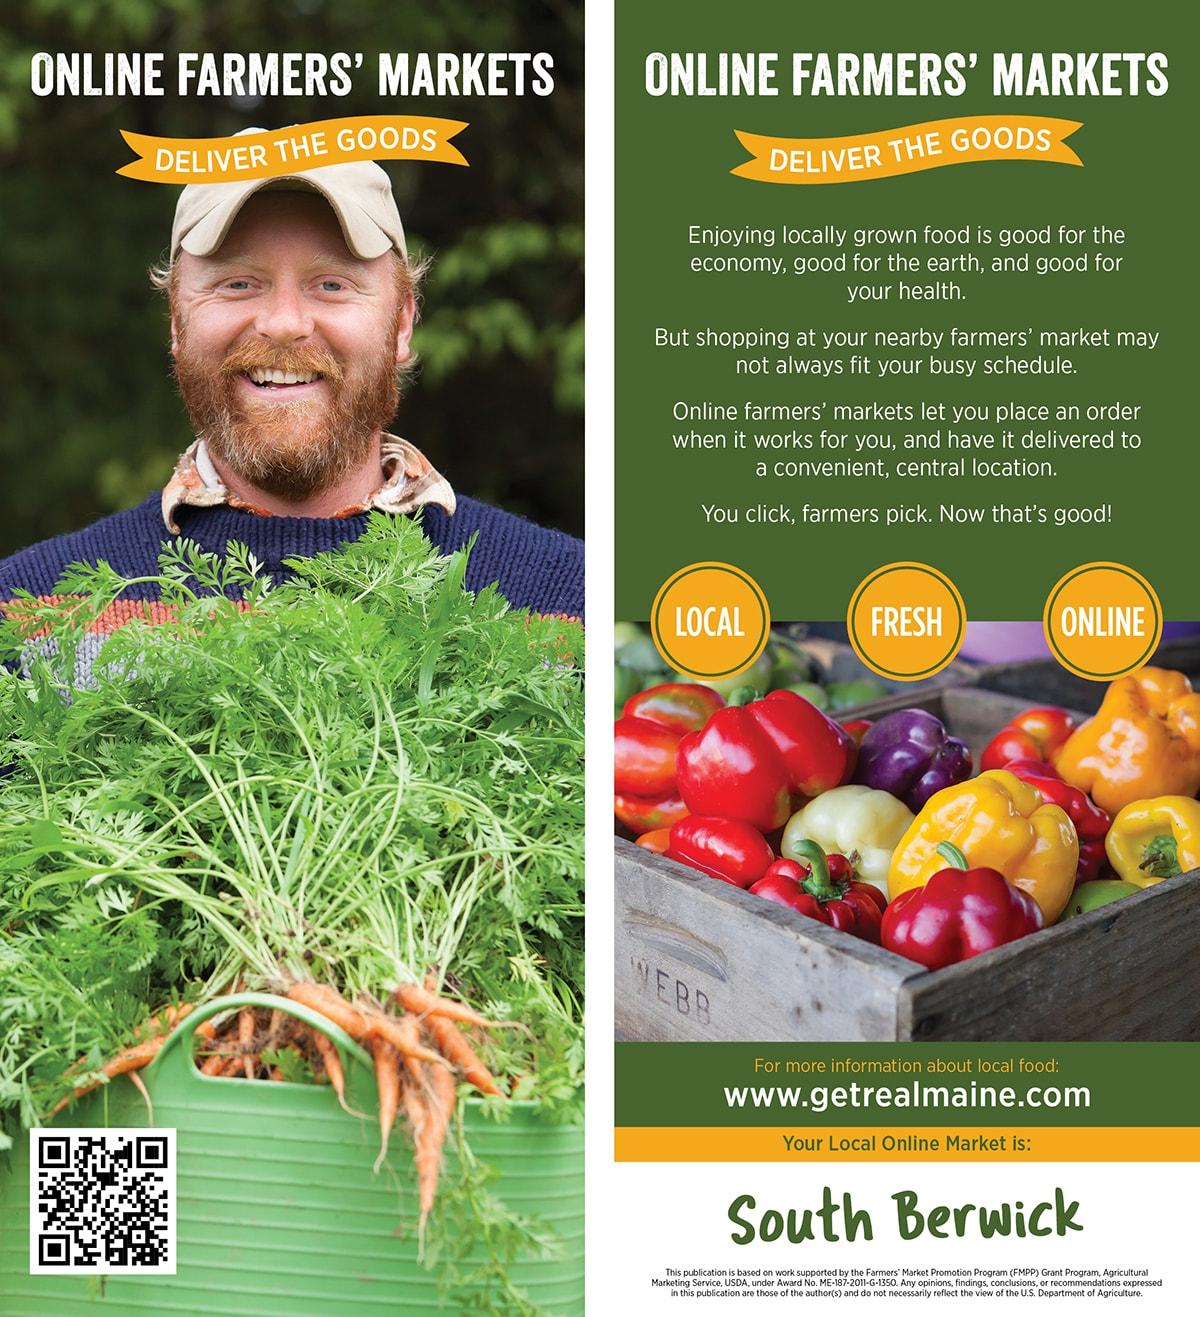 Online Farmers Markets Rackcard 1 Sw